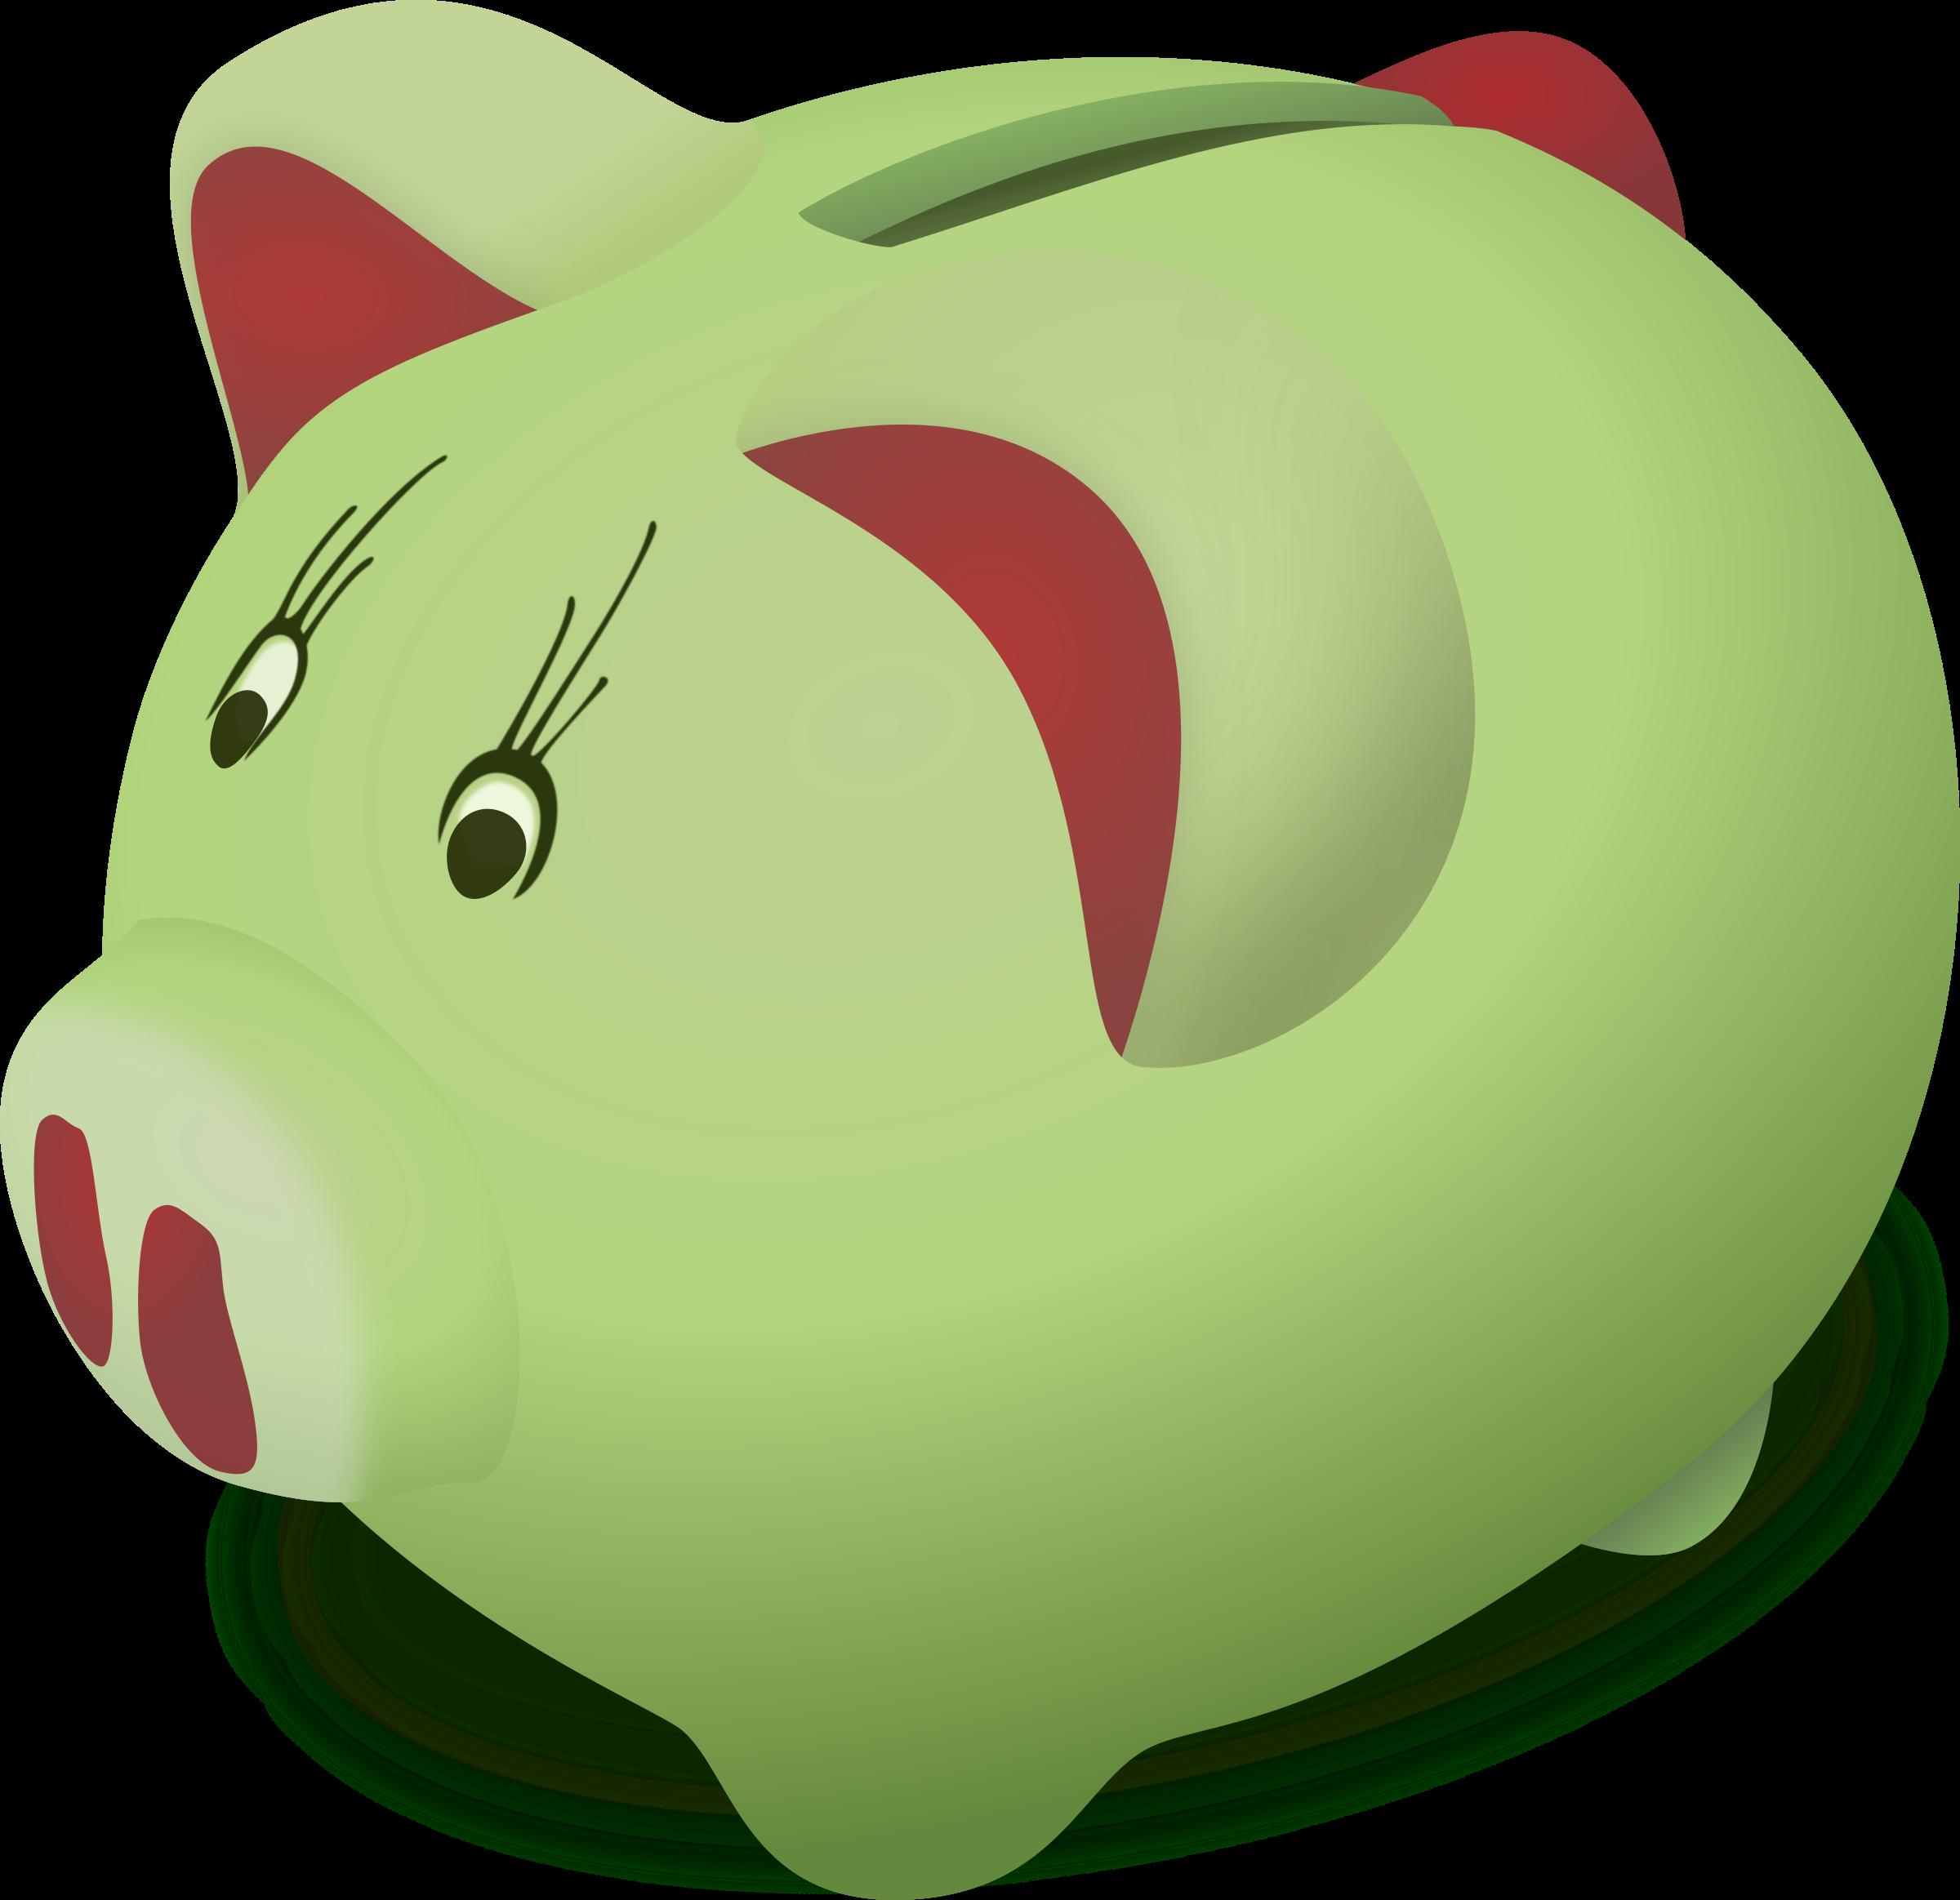 Piggybank by doofi why. Pennies clipart cute